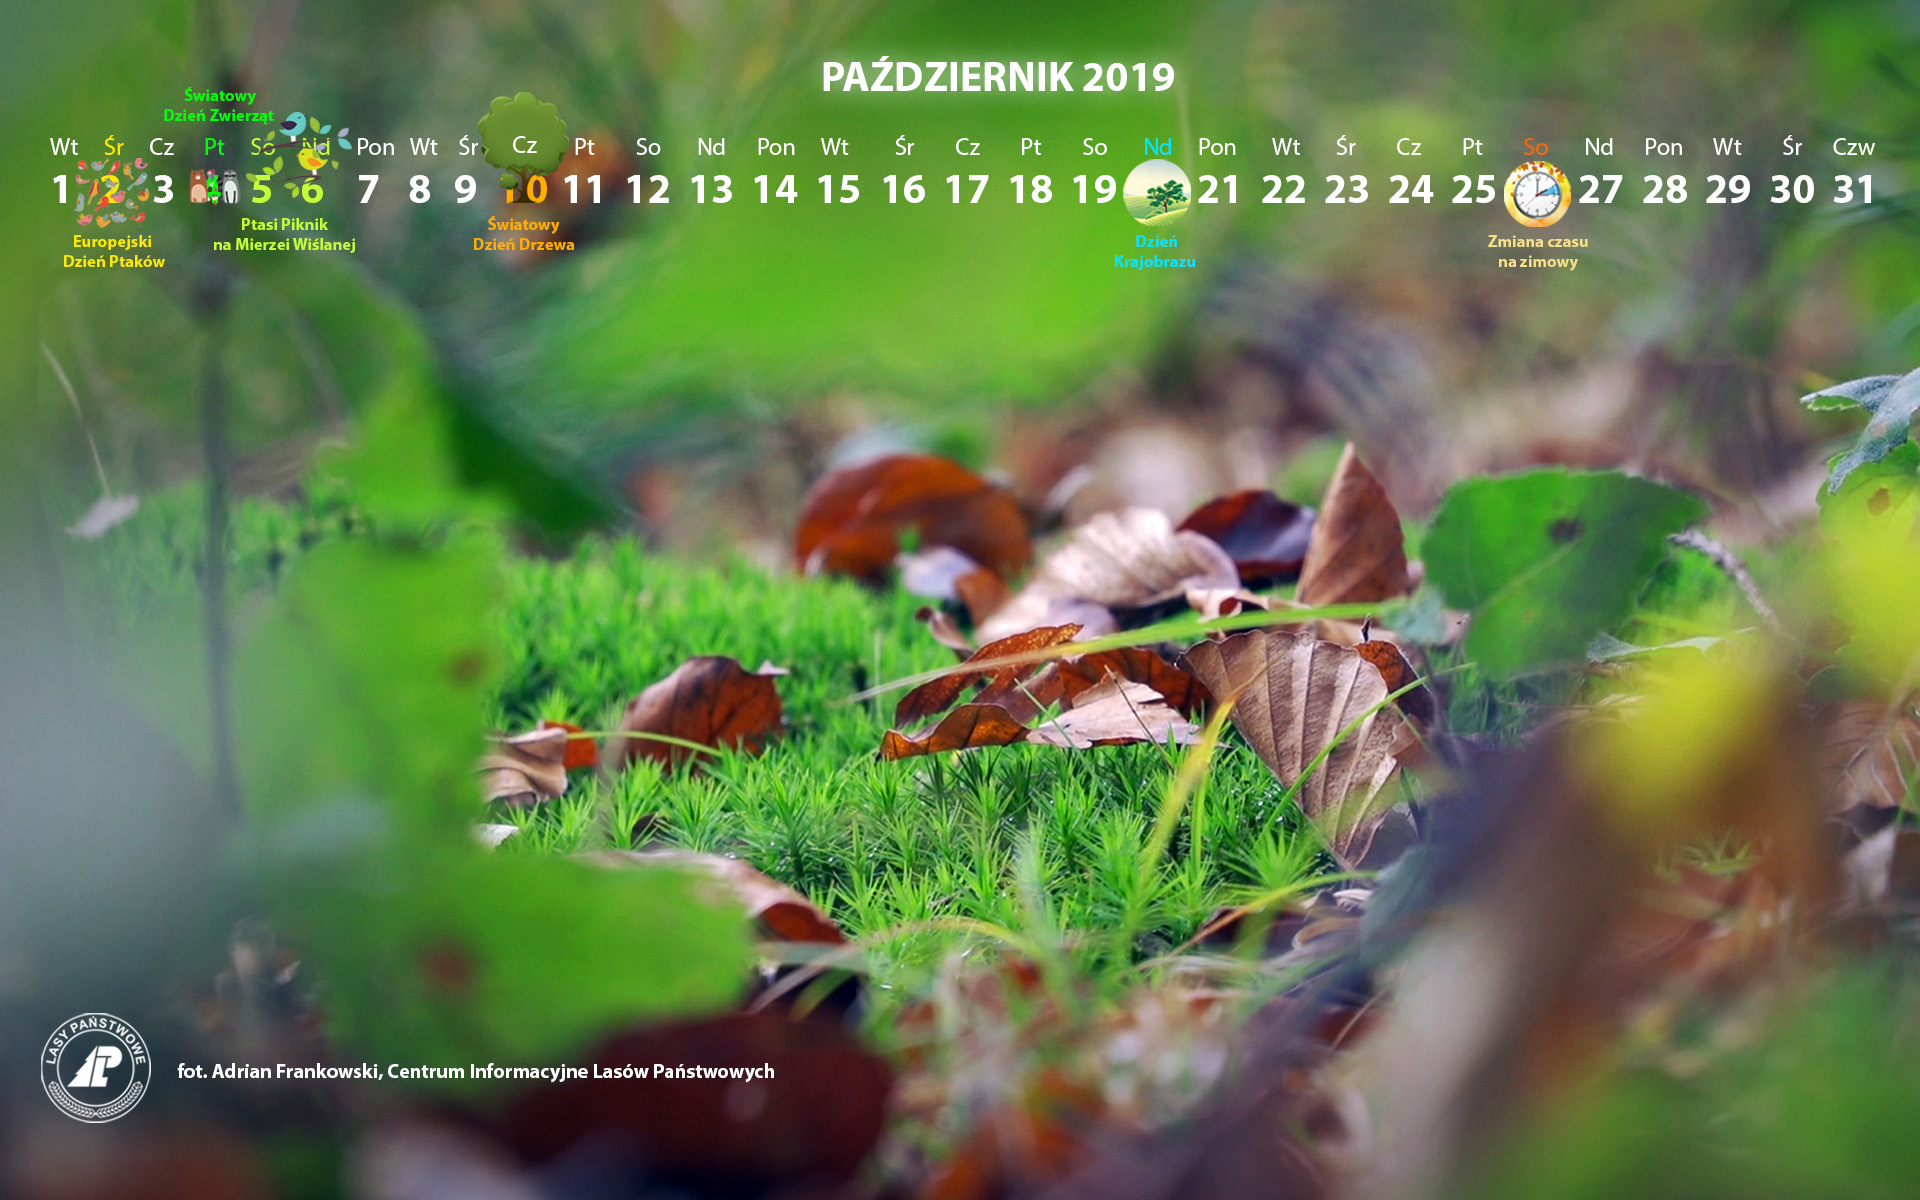 Kalendarz_październik_2019_1920x1200[1].jpg